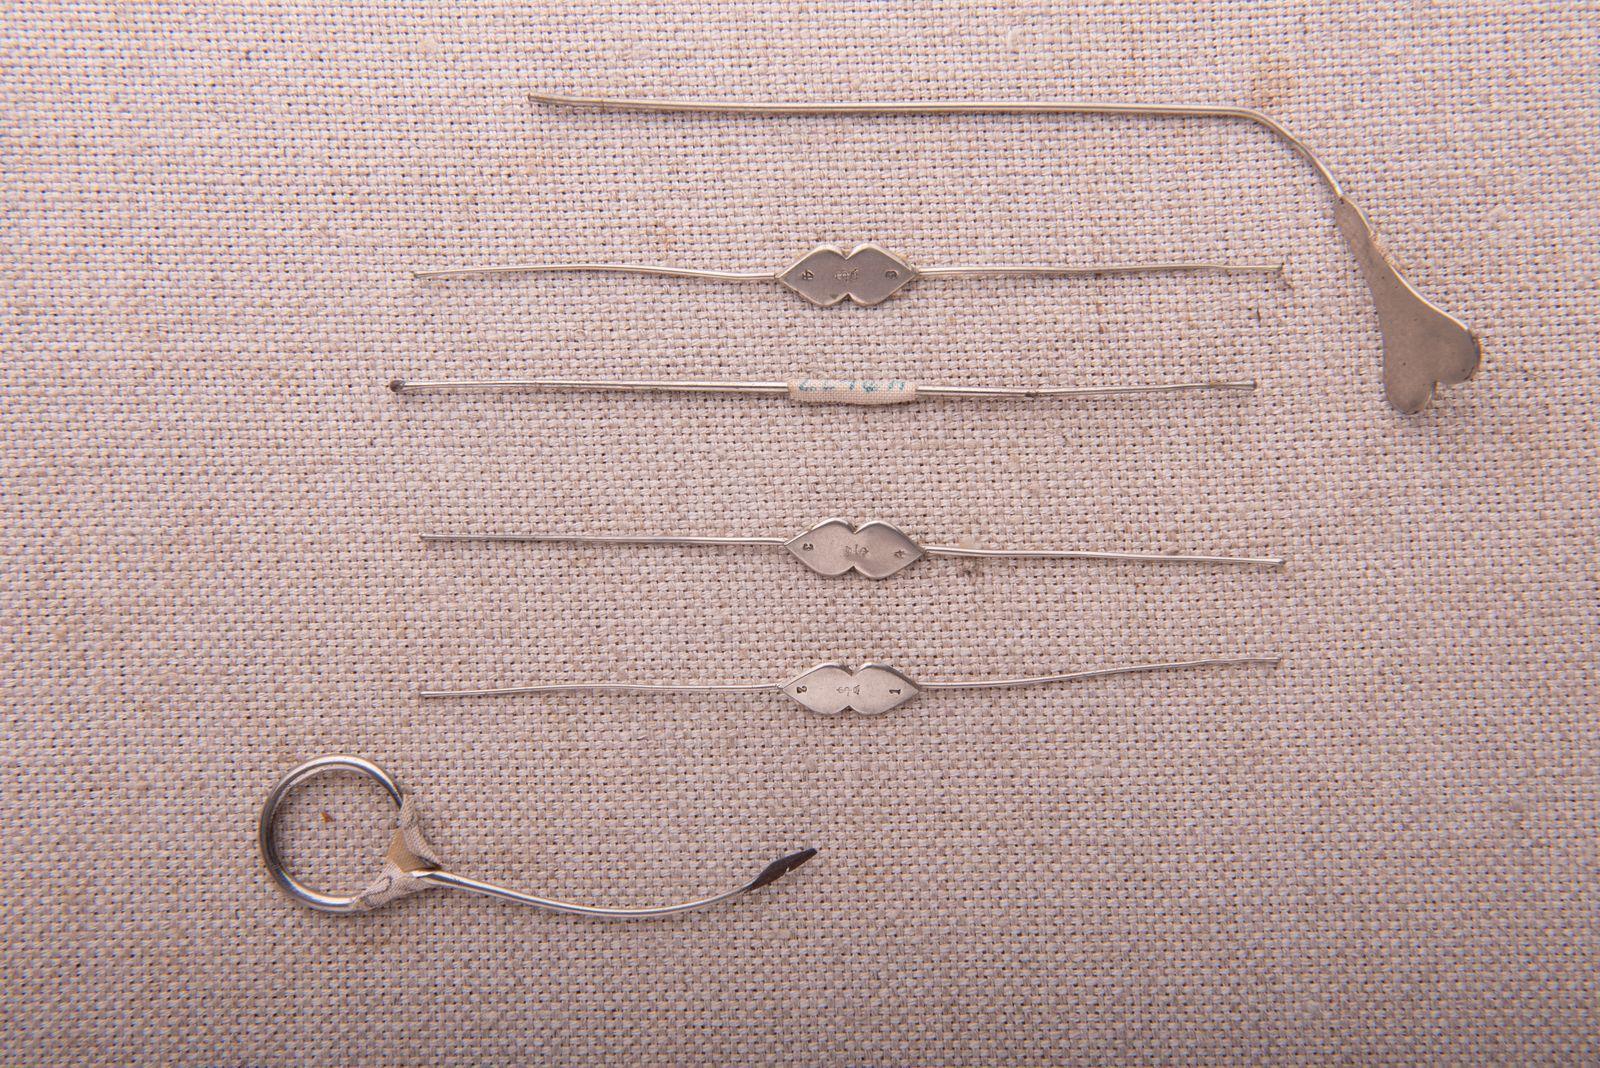 Muzei33_Офталмологичени сонди и игла от средата на 20-ти век